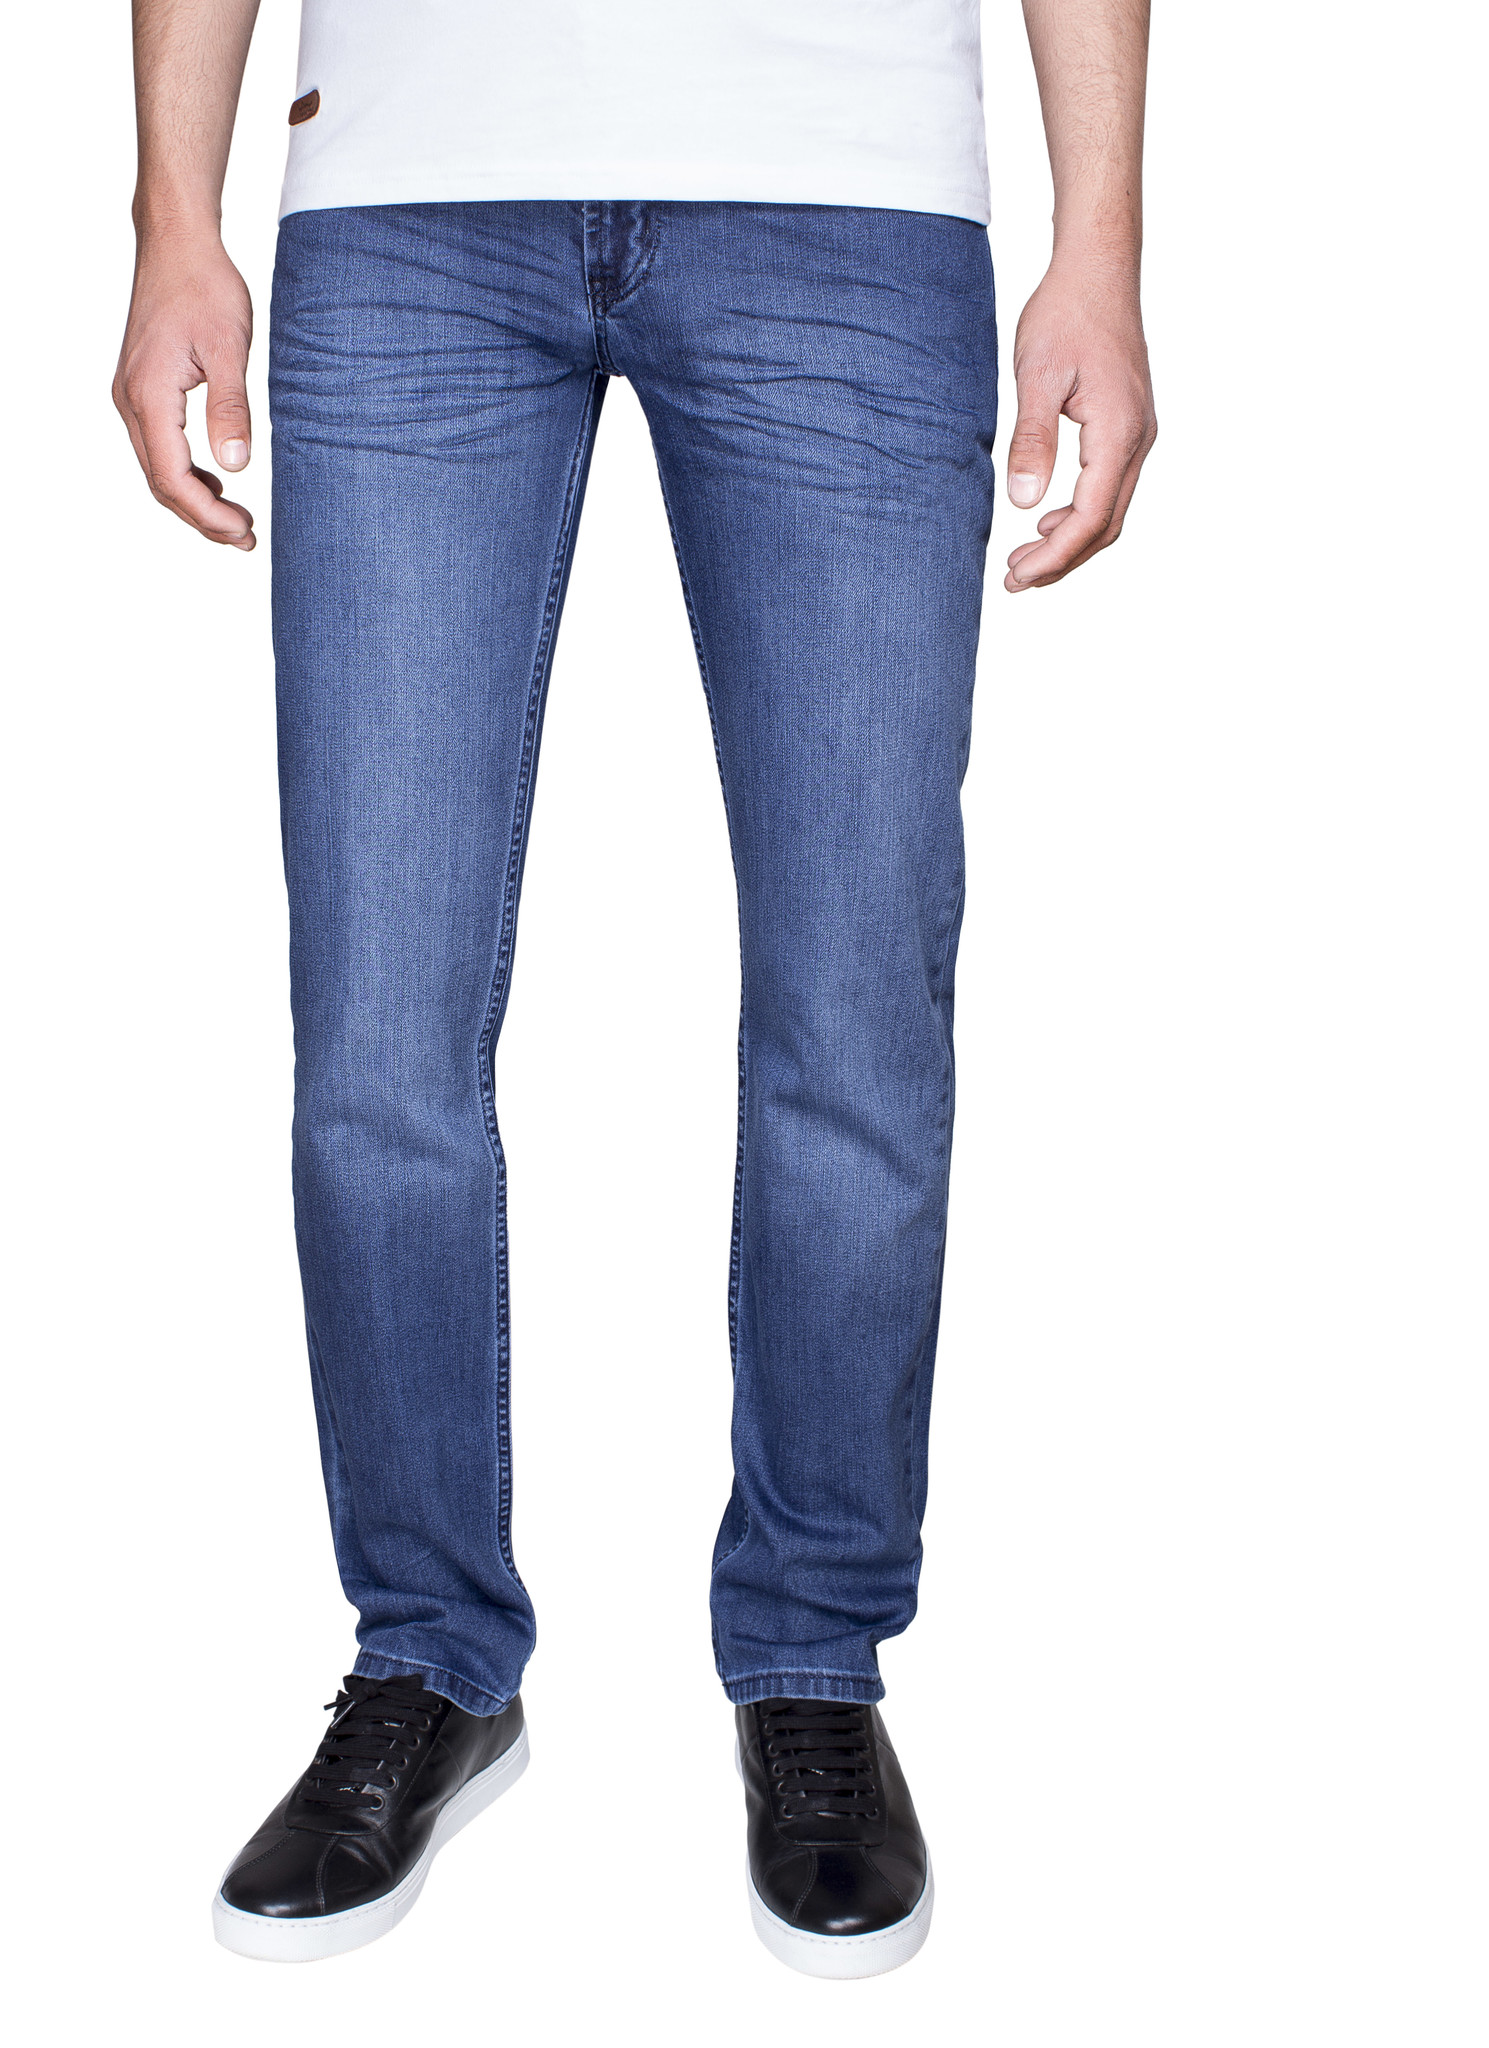 Arya Boy Jeans 85056 Dark